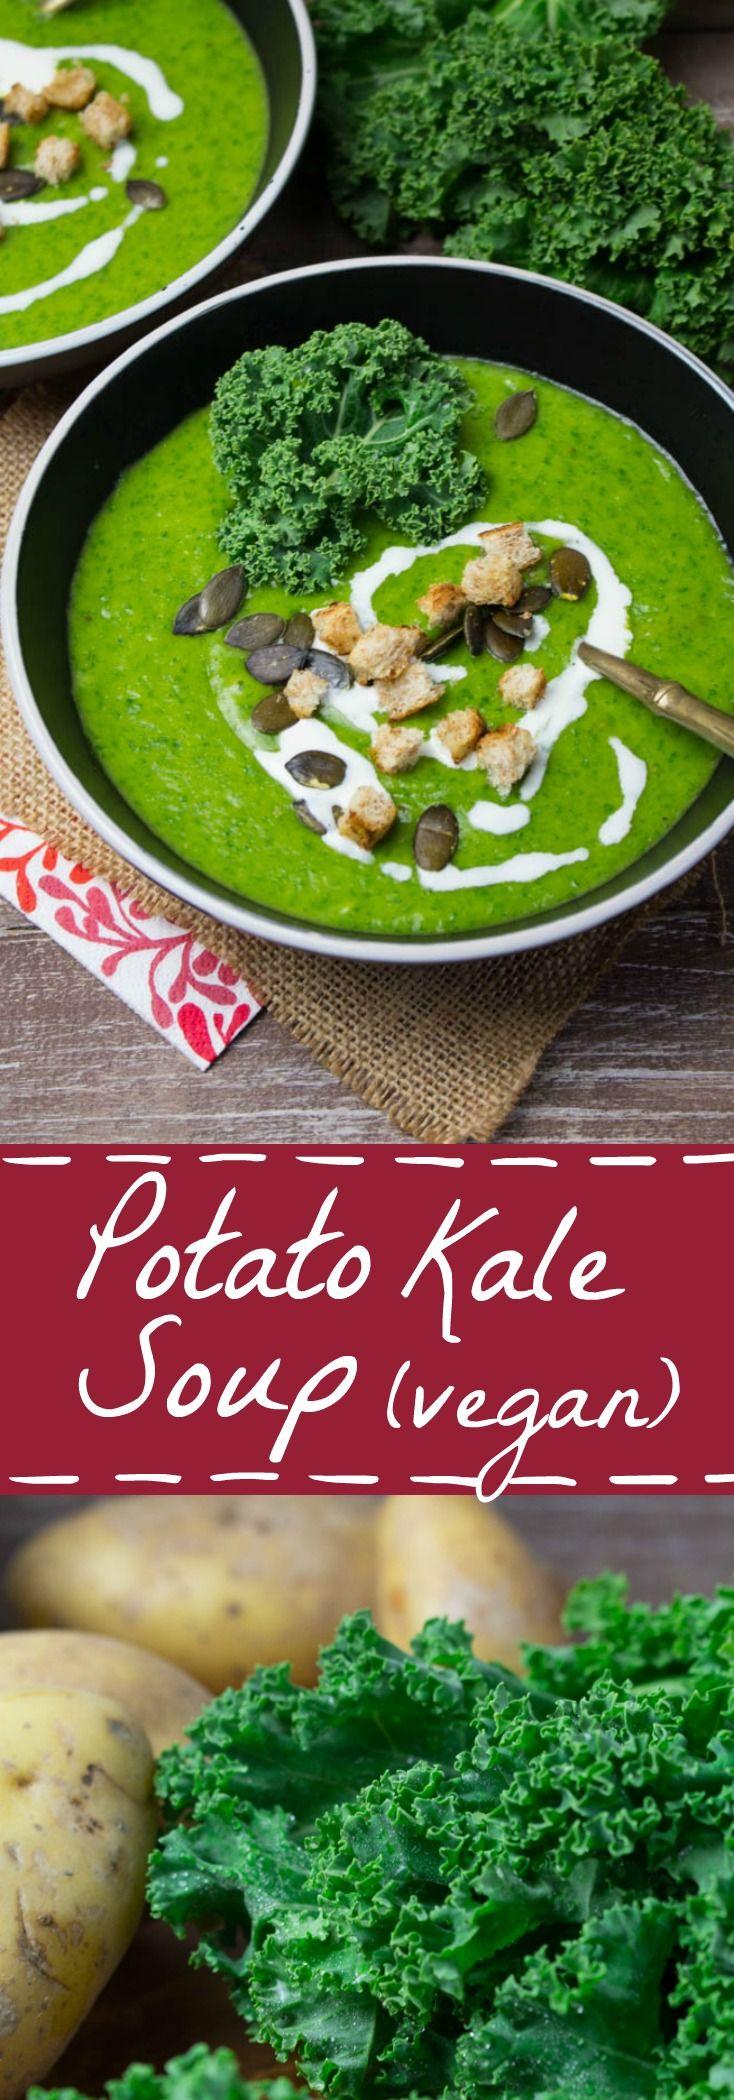 Vegan potato kale soup with celery, carrots, and leek.  MINUS the vegan margarine!